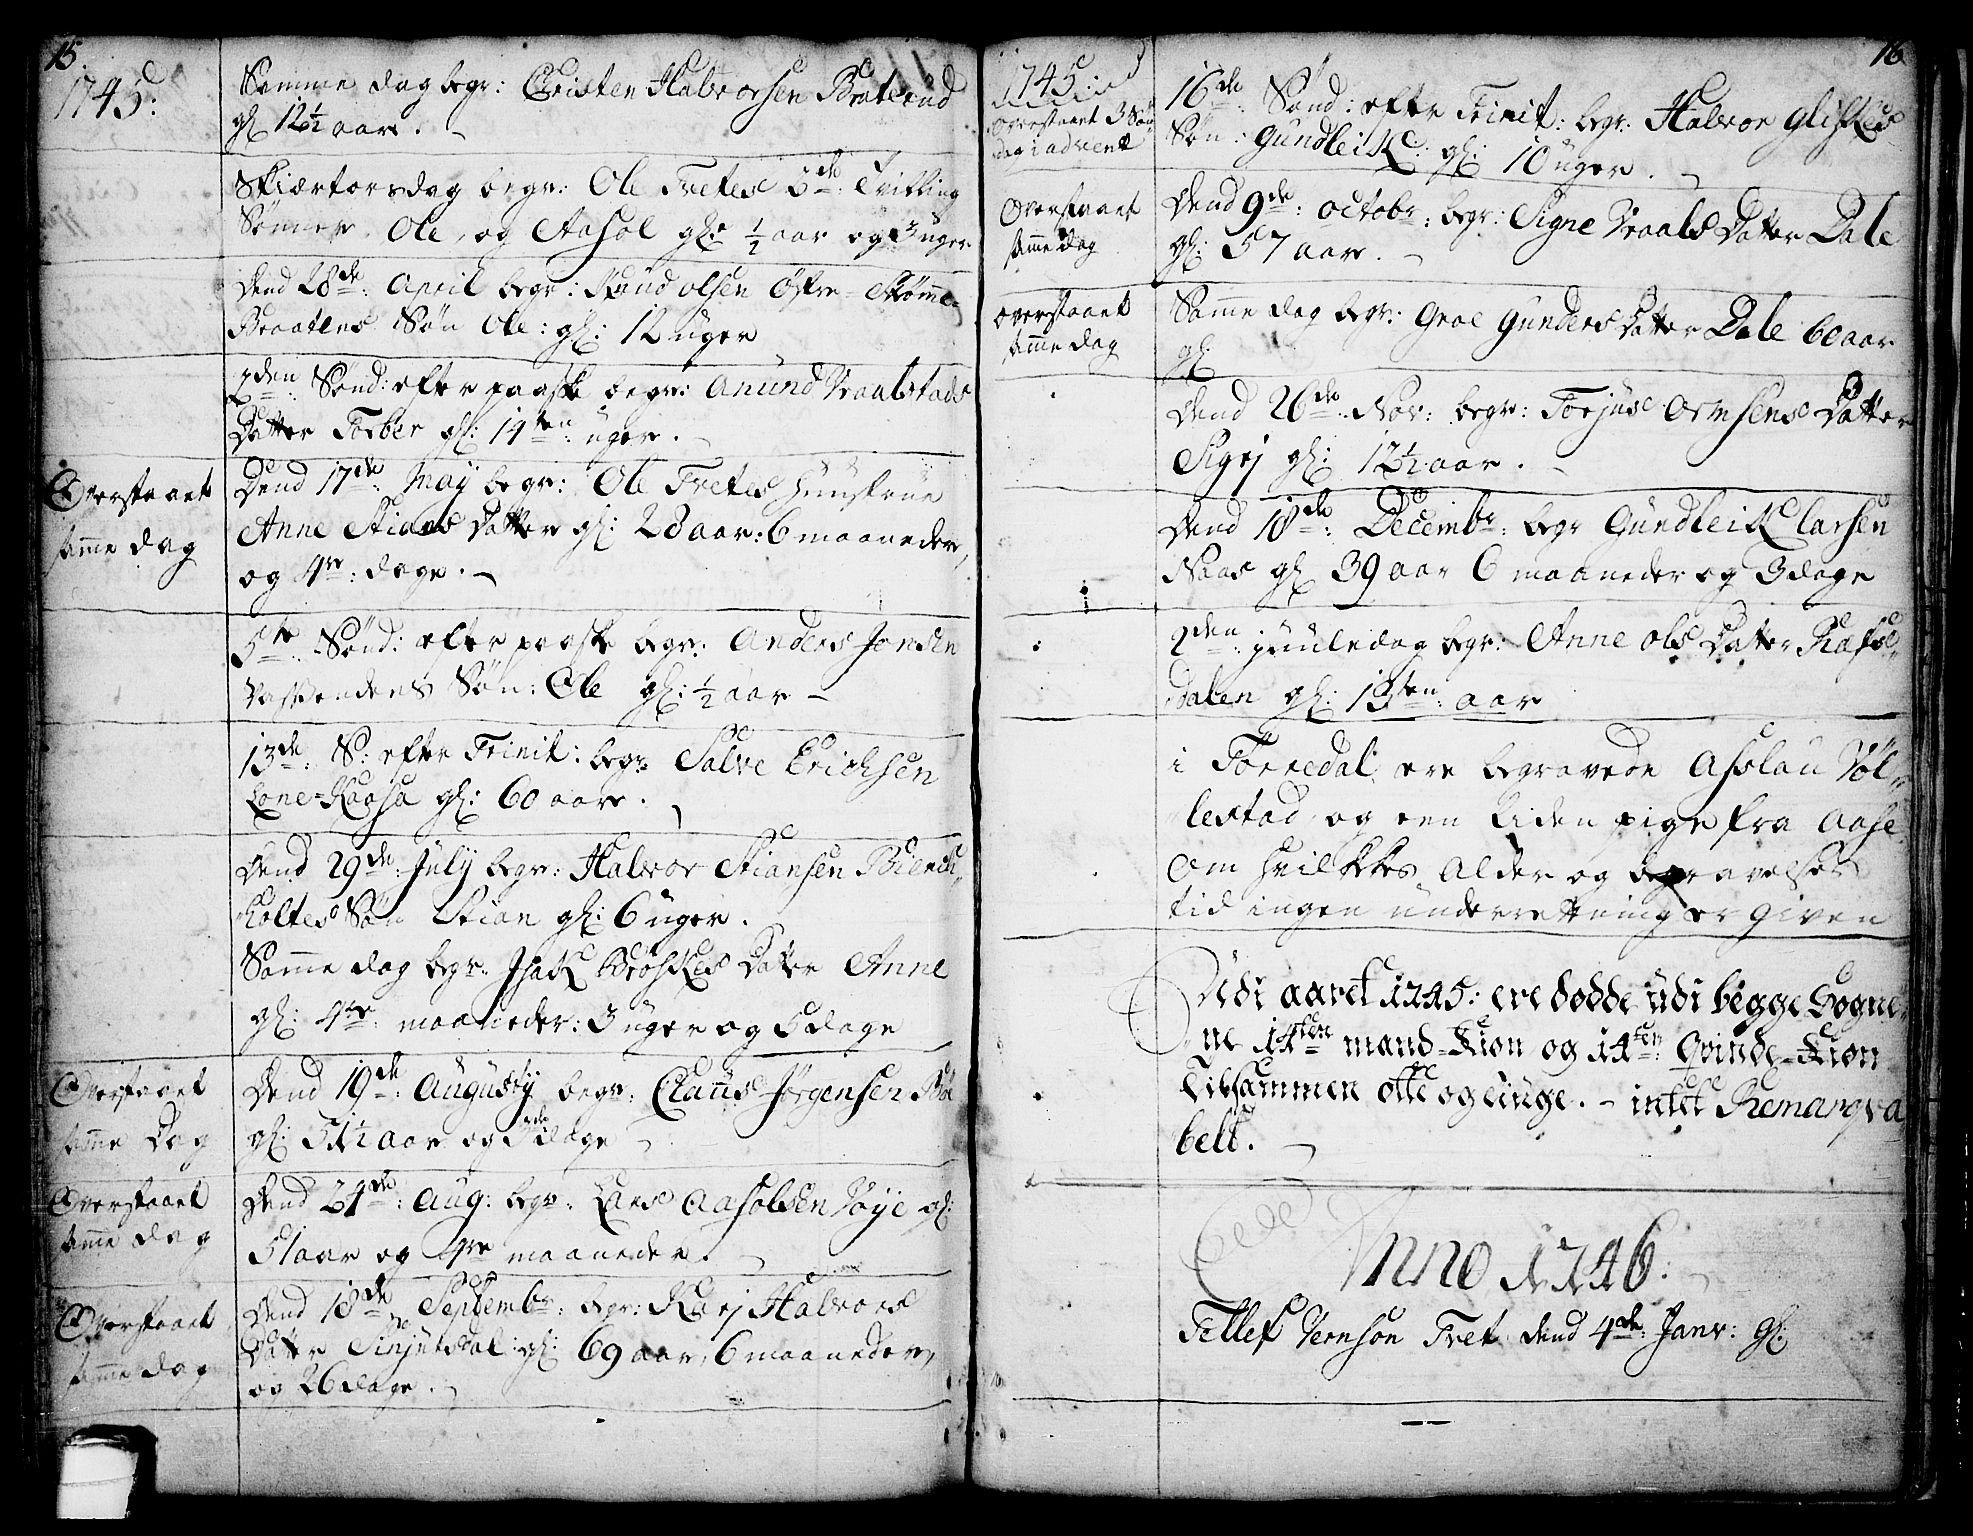 SAKO, Drangedal kirkebøker, F/Fa/L0002: Ministerialbok nr. 2, 1733-1753, s. 15-16